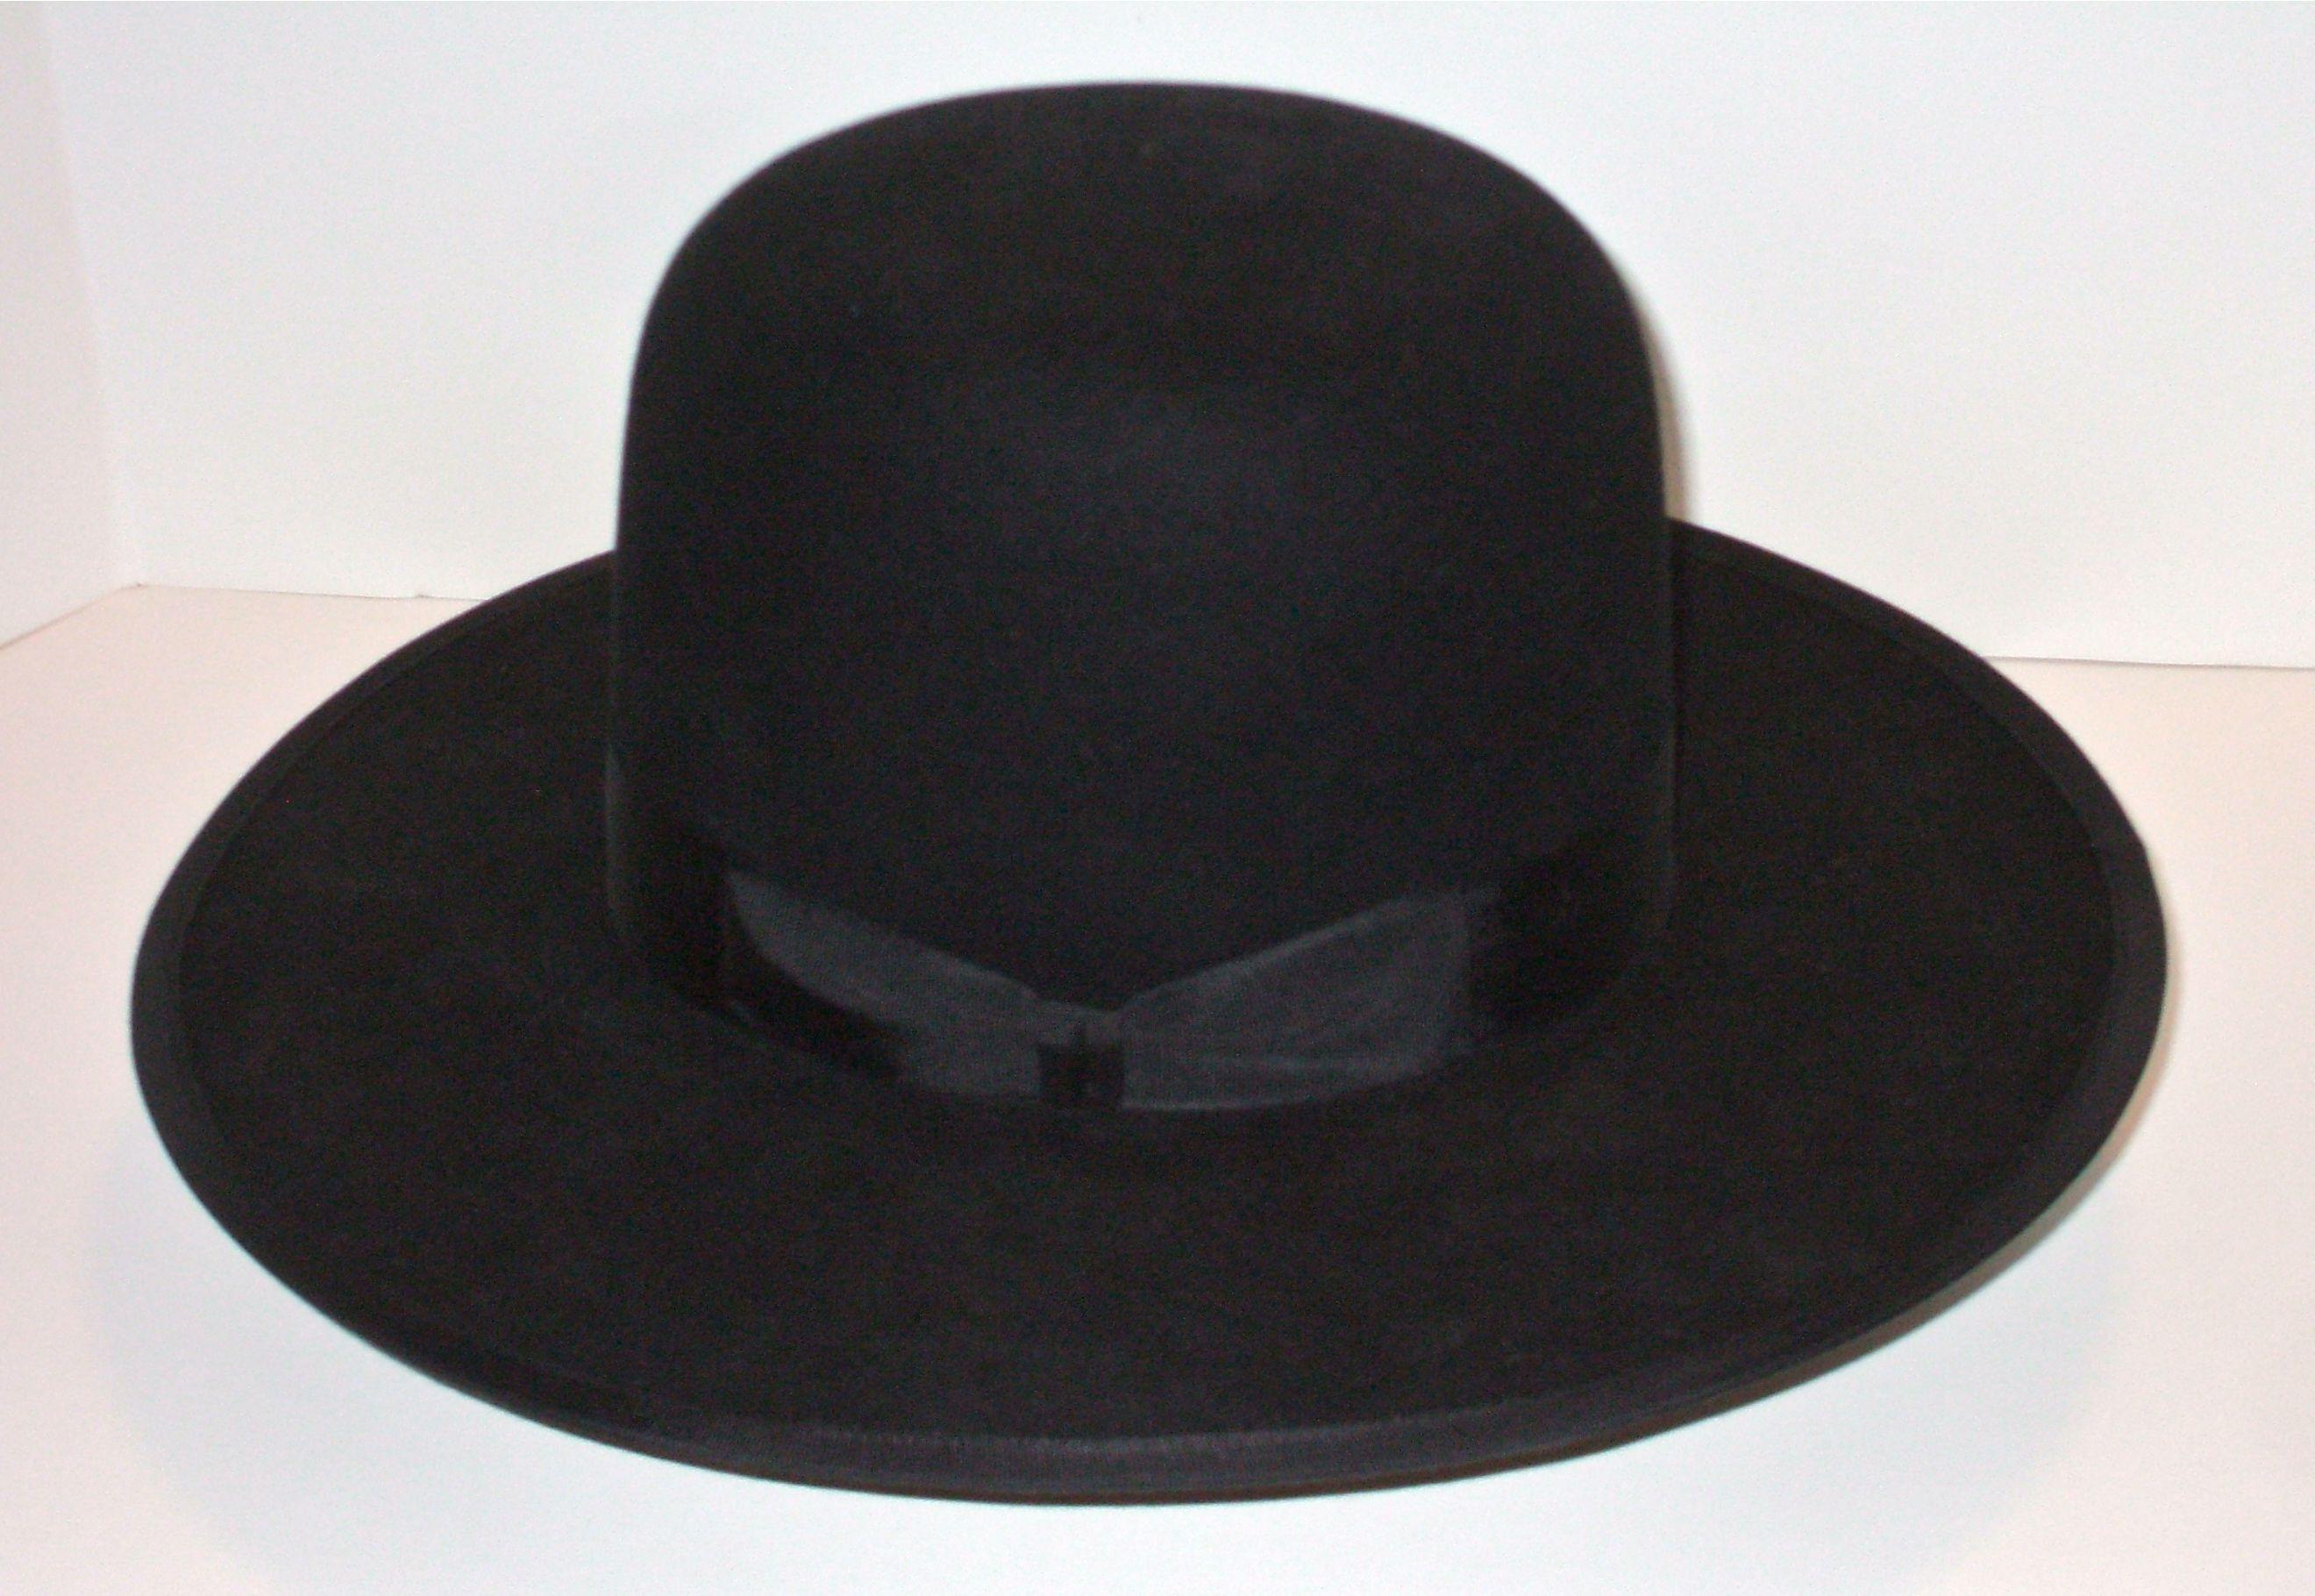 05a406955 Custom Made Wyatt Earp Tombstone Movie Hat by Gomez Hat Company ...